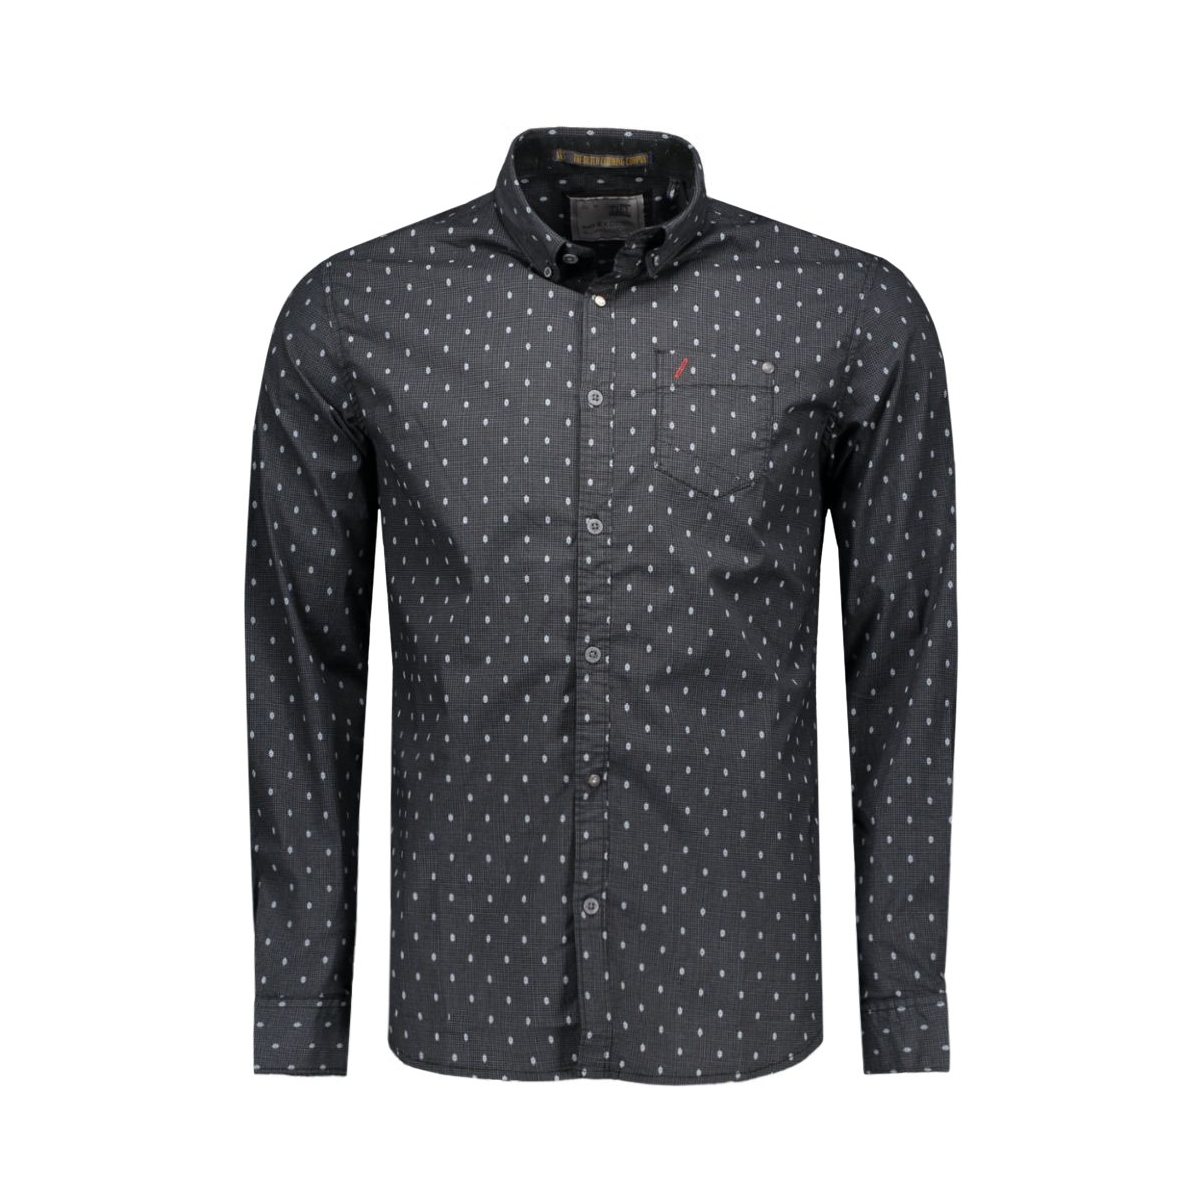 78-480818 no-excess overhemd 025 motorblack